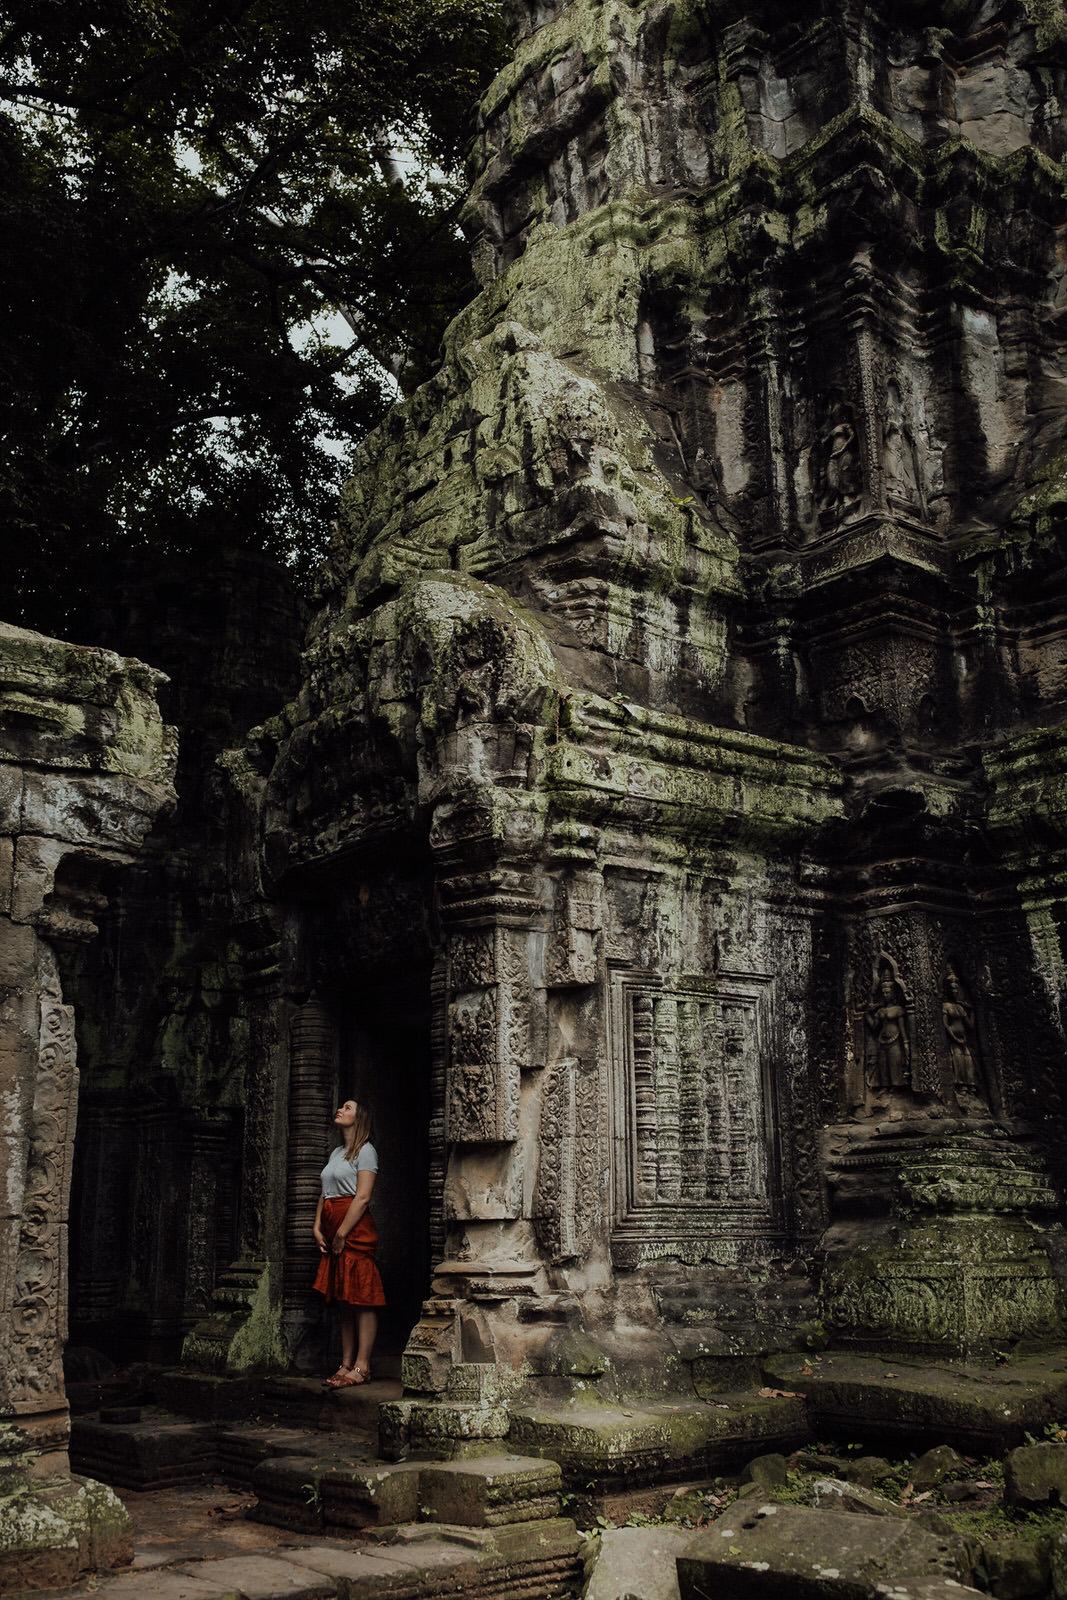 angkor-thom_001(1873).jpg